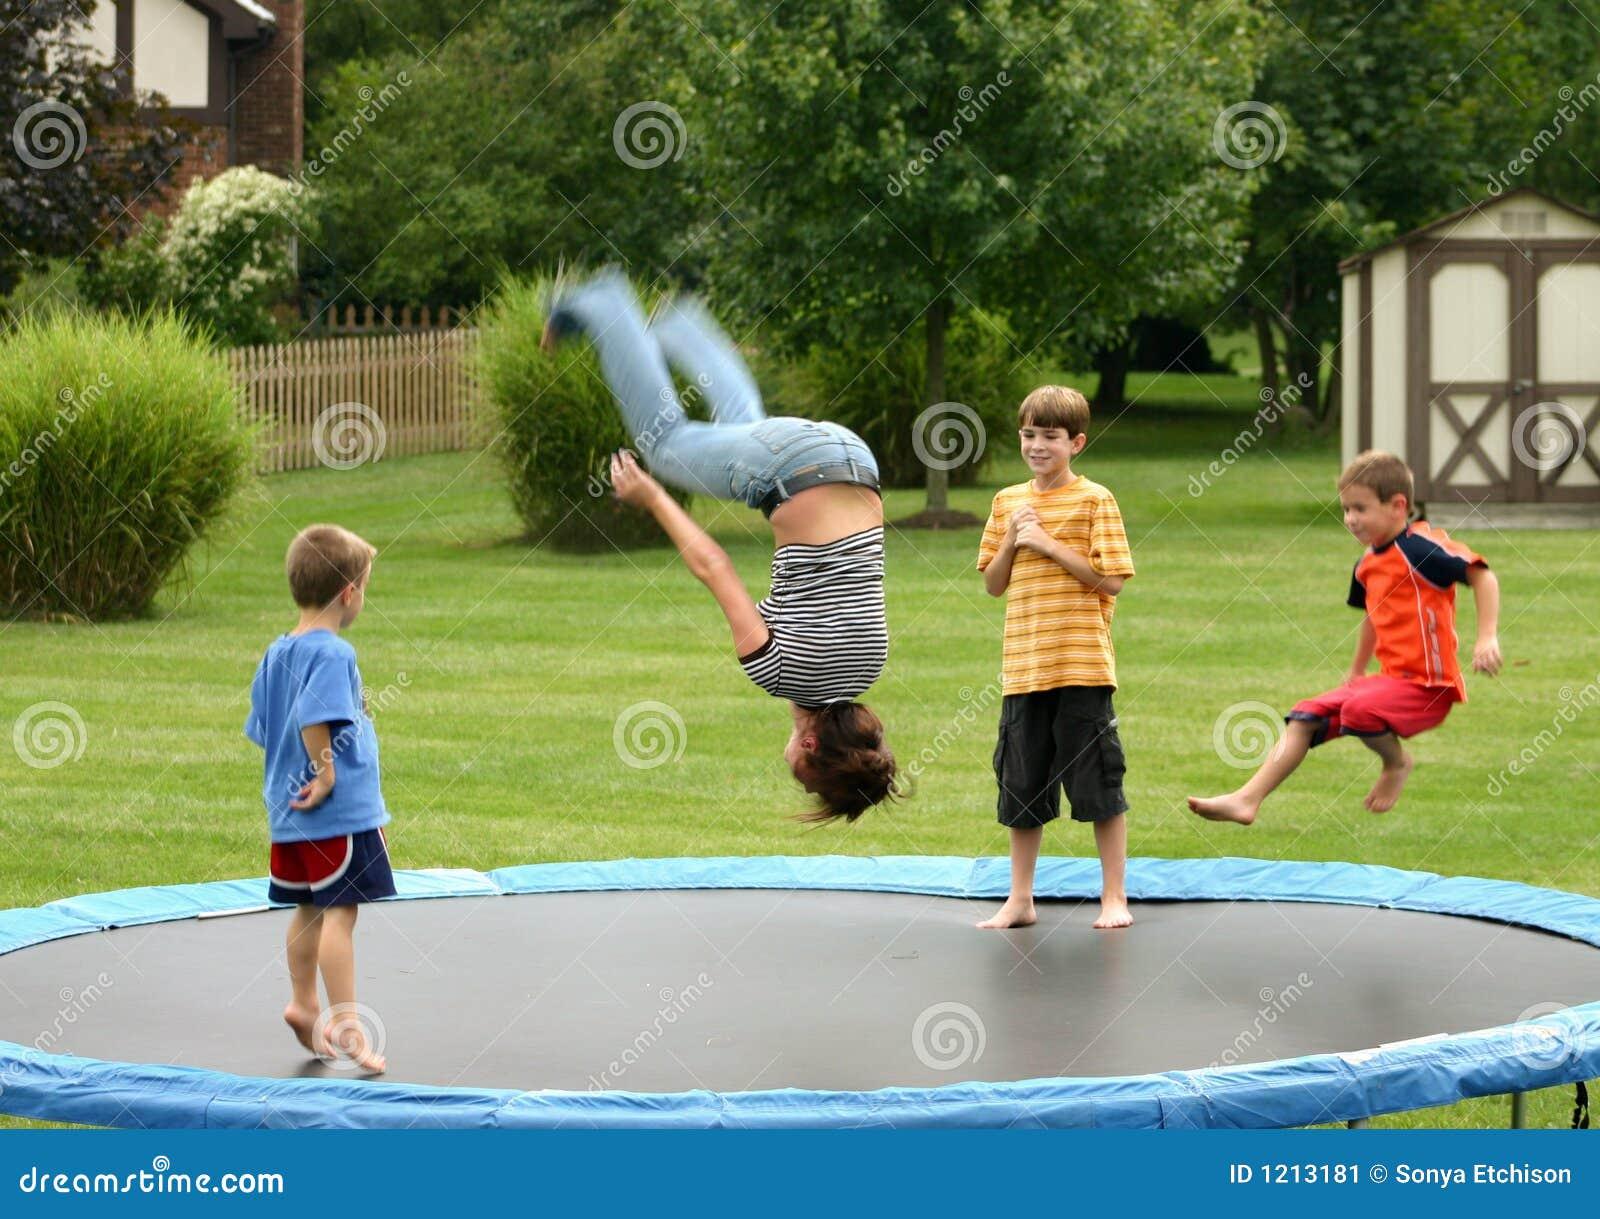 Kids On Trampoline Stock Image Image 1213181